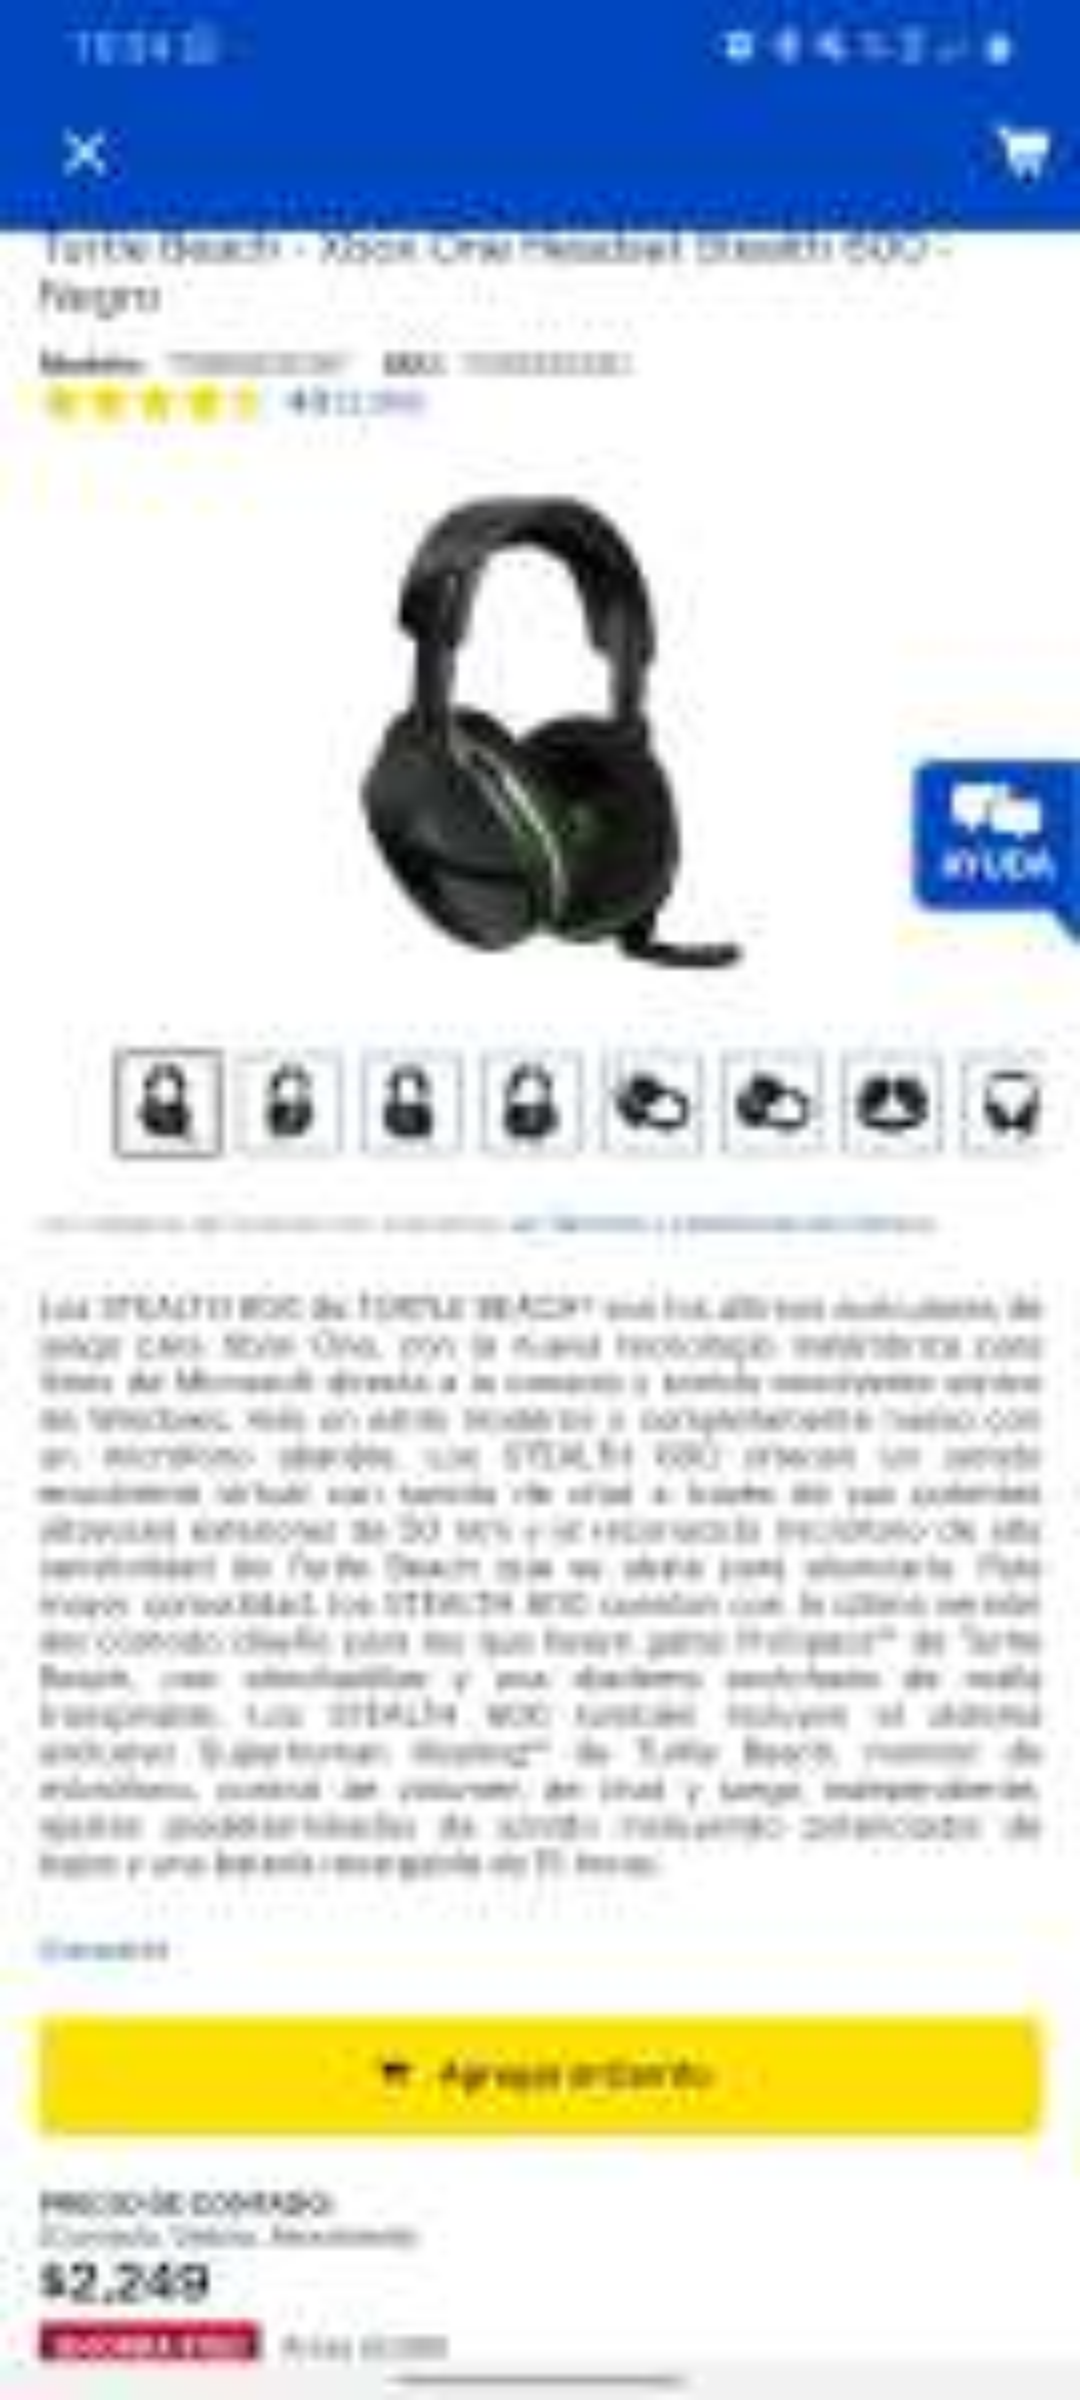 Best Buy: Audifonos inalambricos turtle beach 600 para pc y xbox